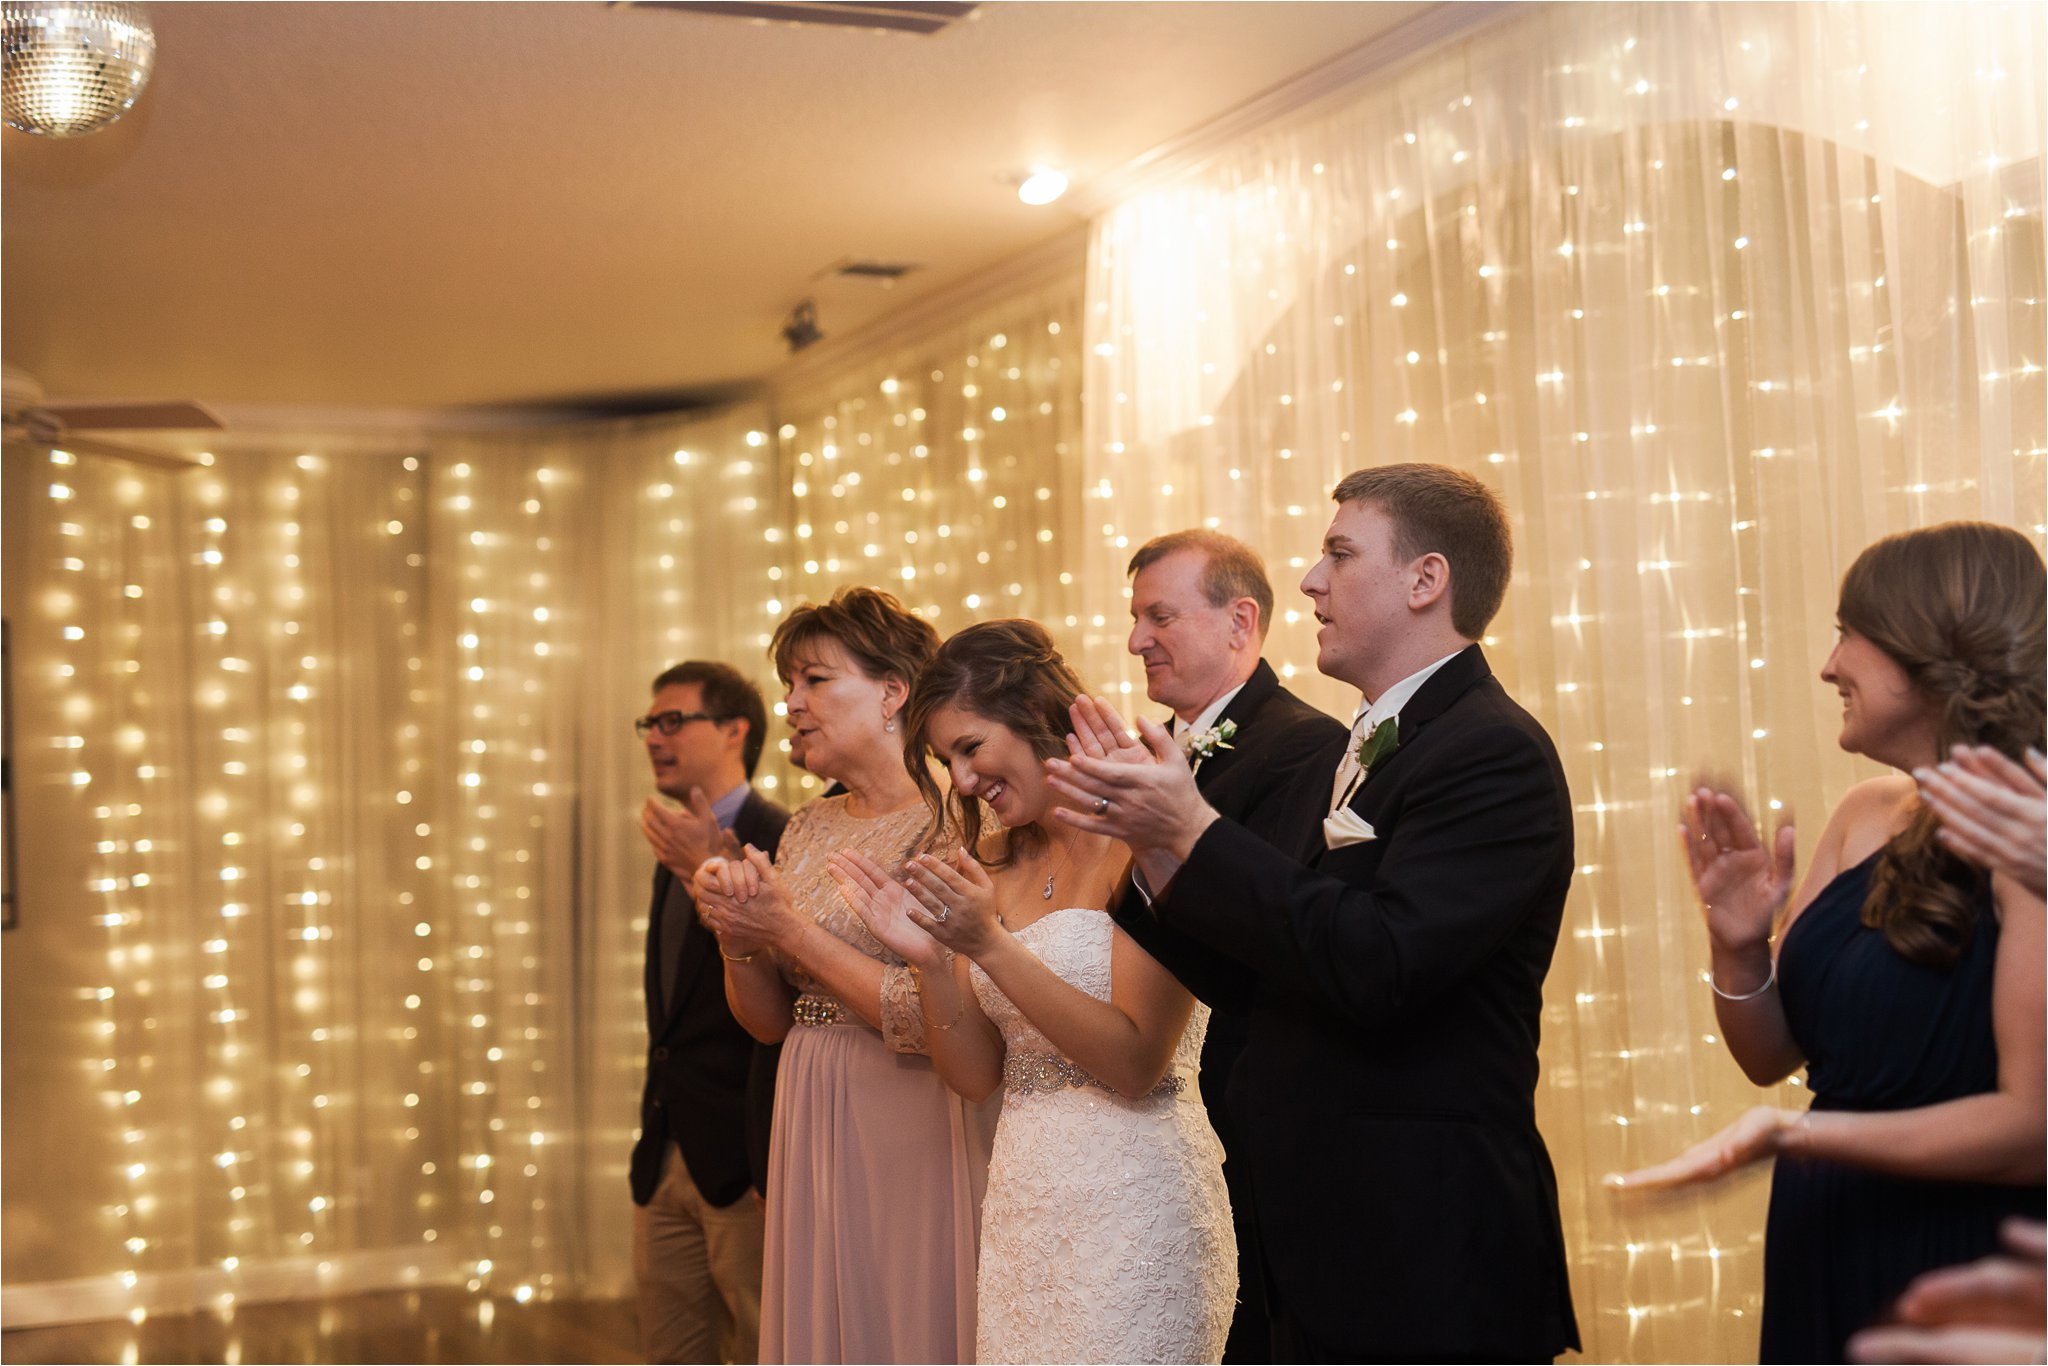 lunsford-wedding-975.jpg